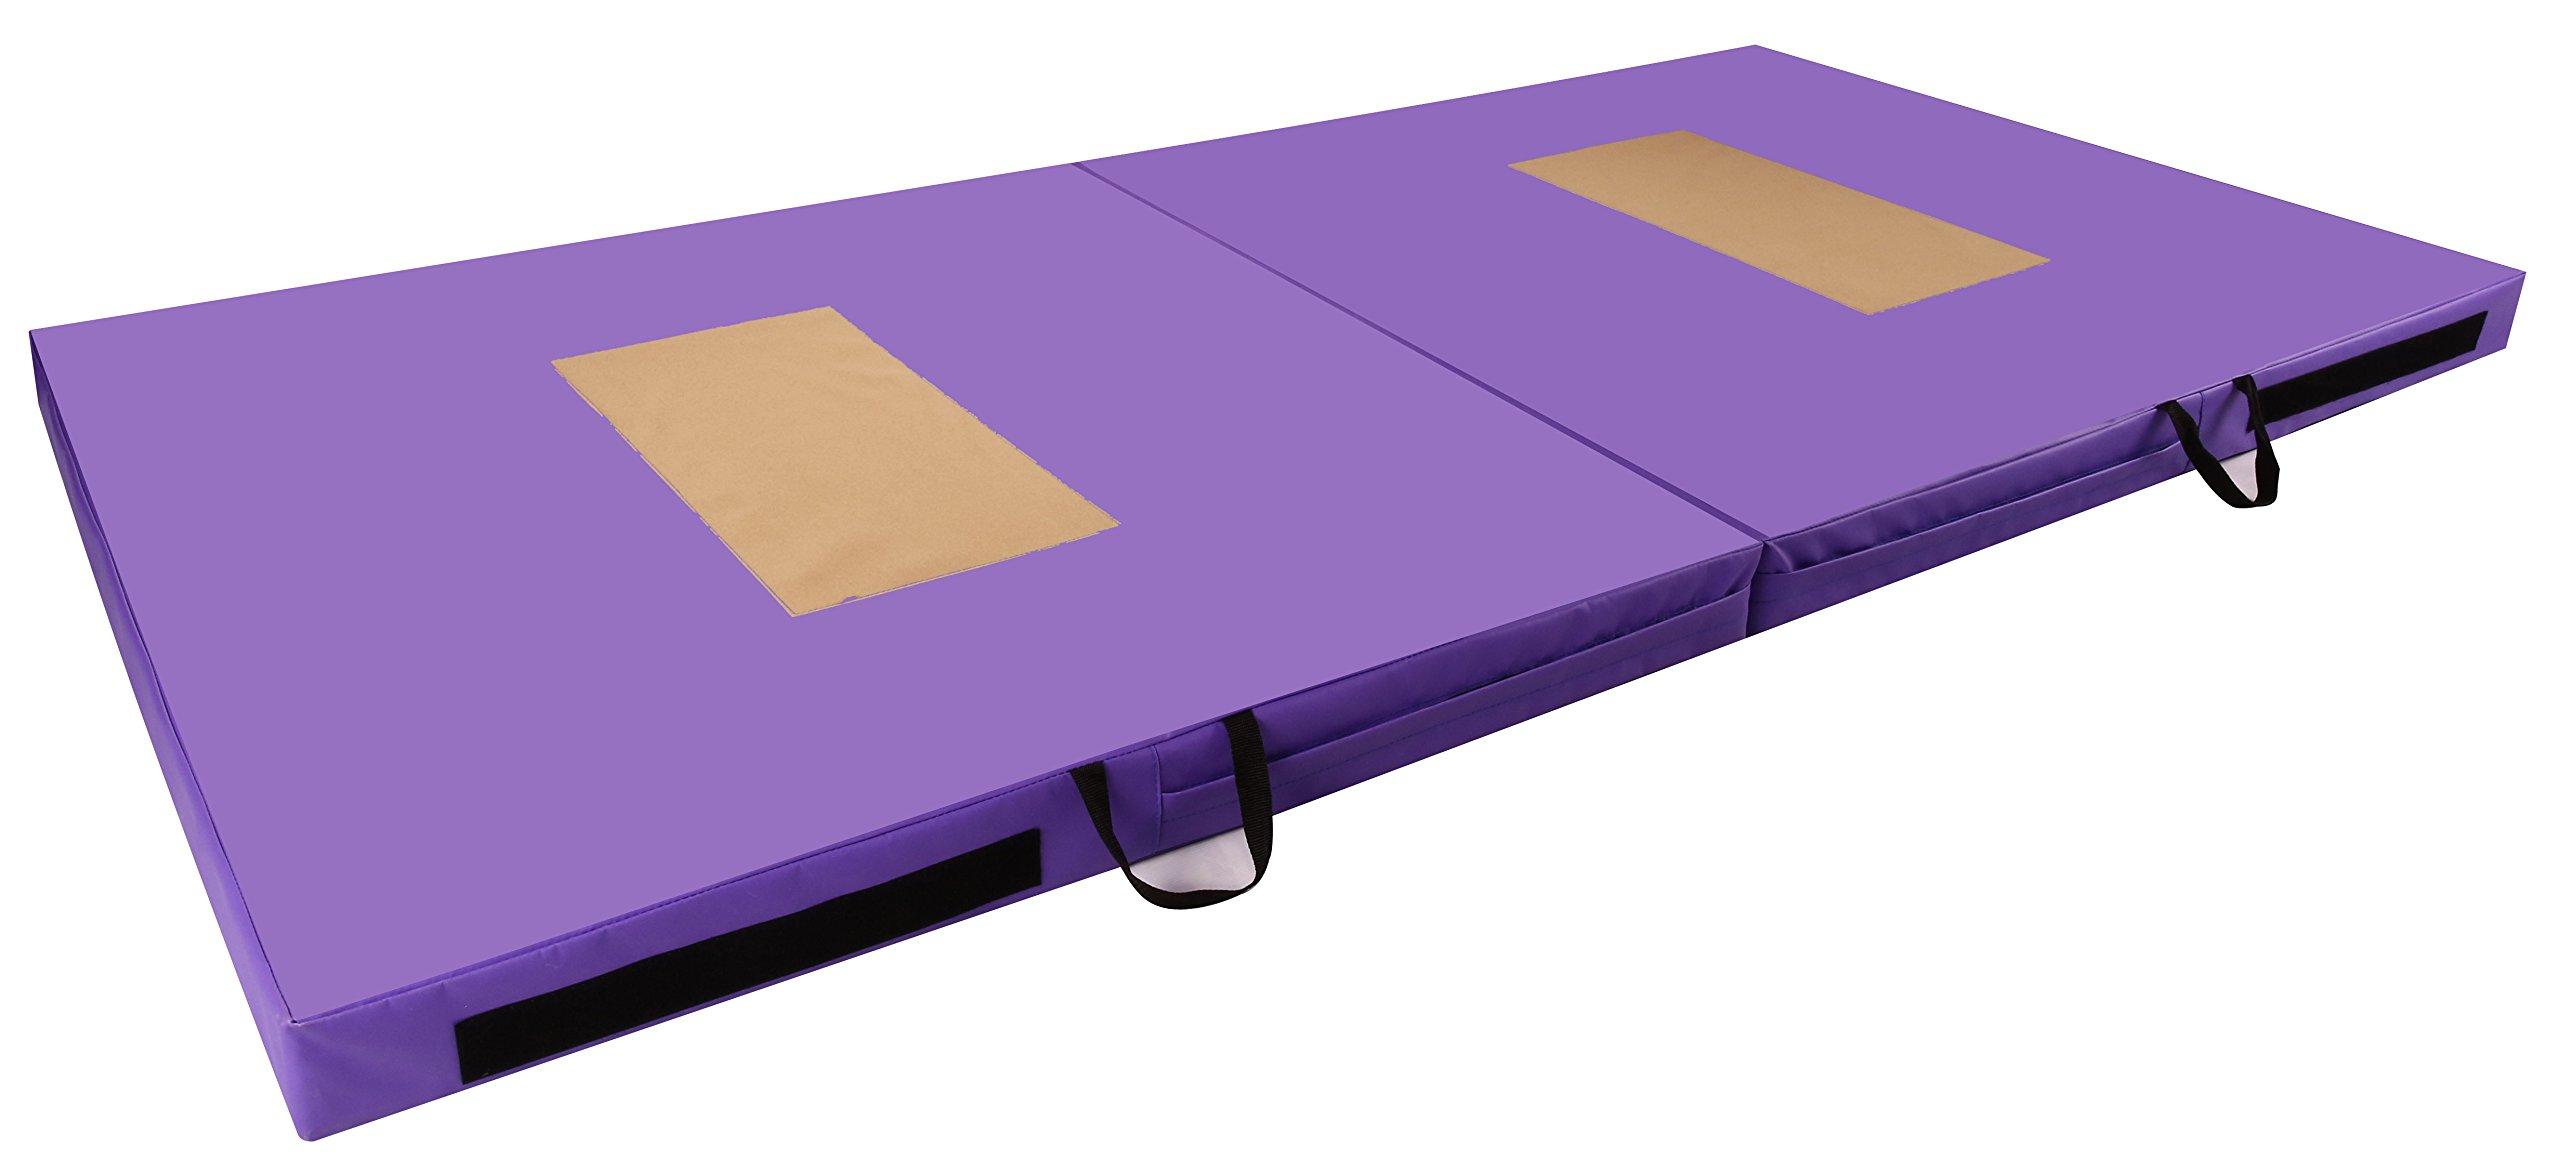 BalanceFrom GoGym All-Purpose 4'x8'x4 Extra Thick High Density Anti-Tear Gymnastics Gym Folding Exercise Aerobics Mats (Purple)